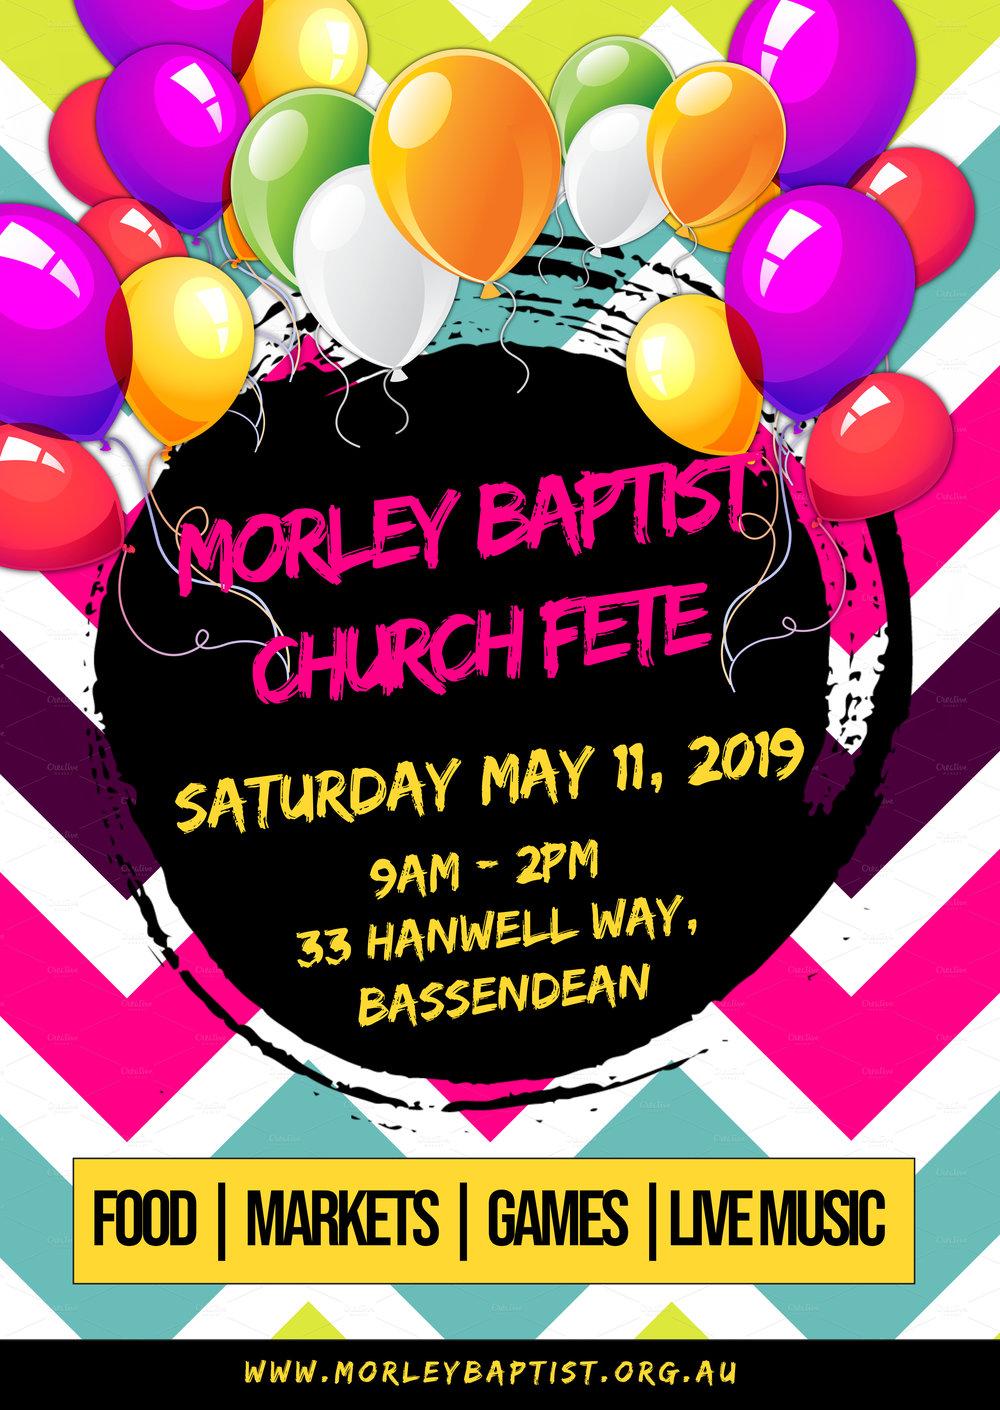 Church Fete Flyer 2019.jpg